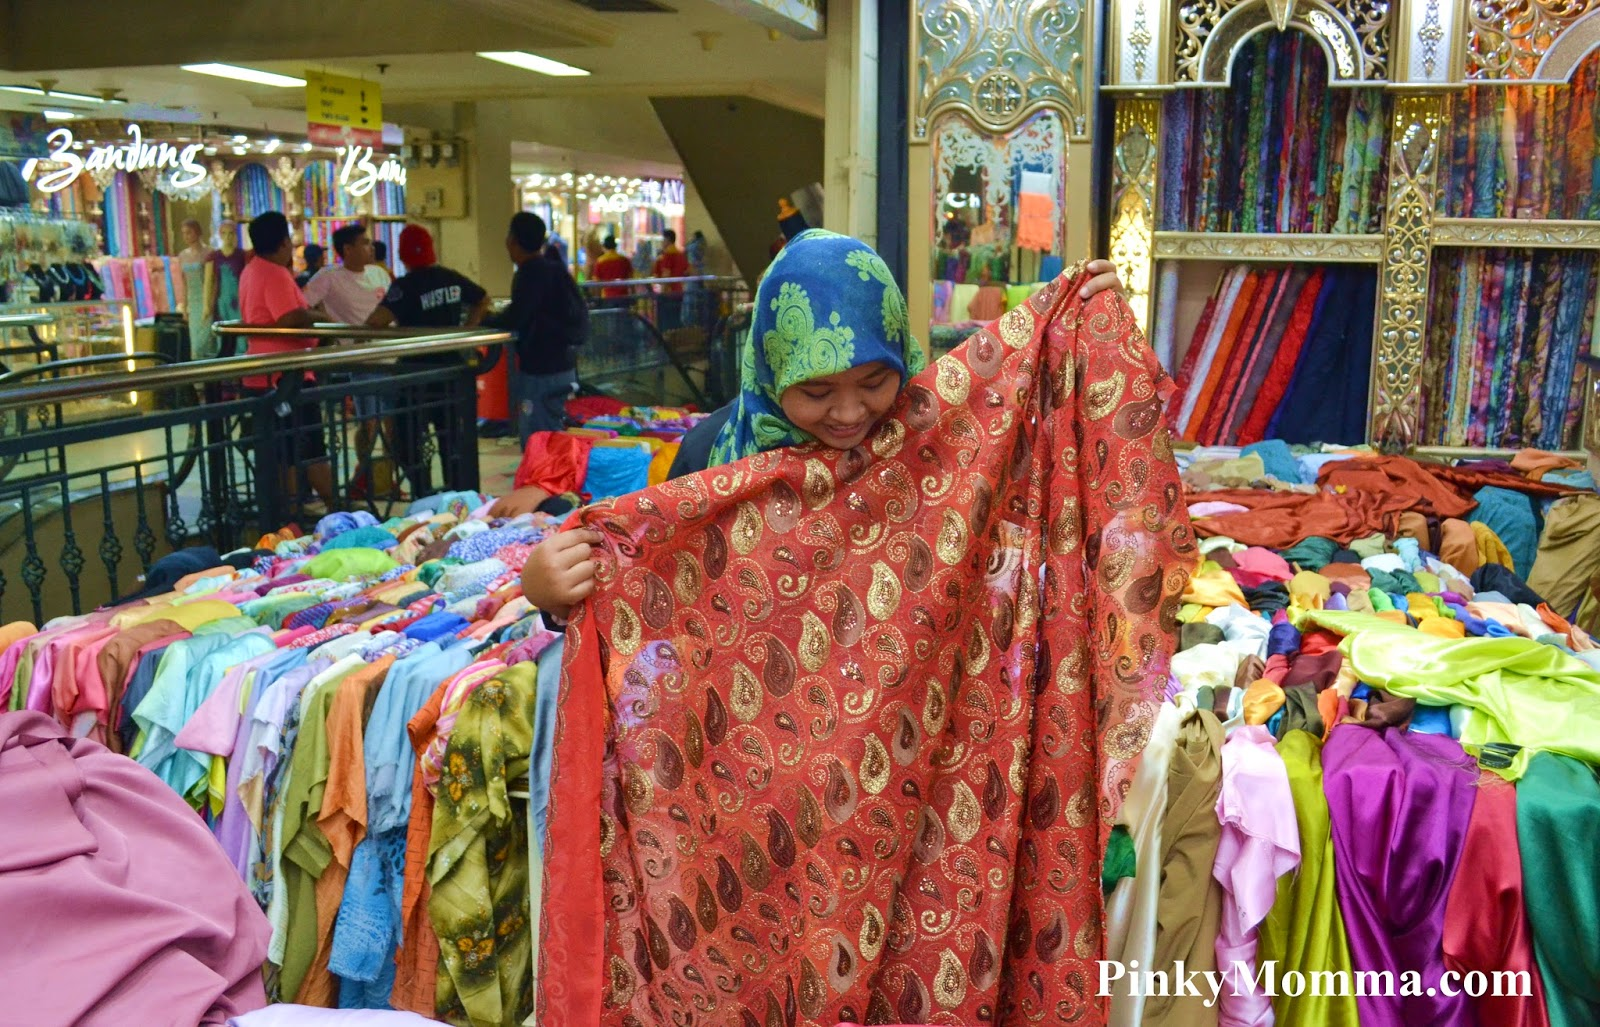 Pinky momma Baju gamis pasar baru bandung